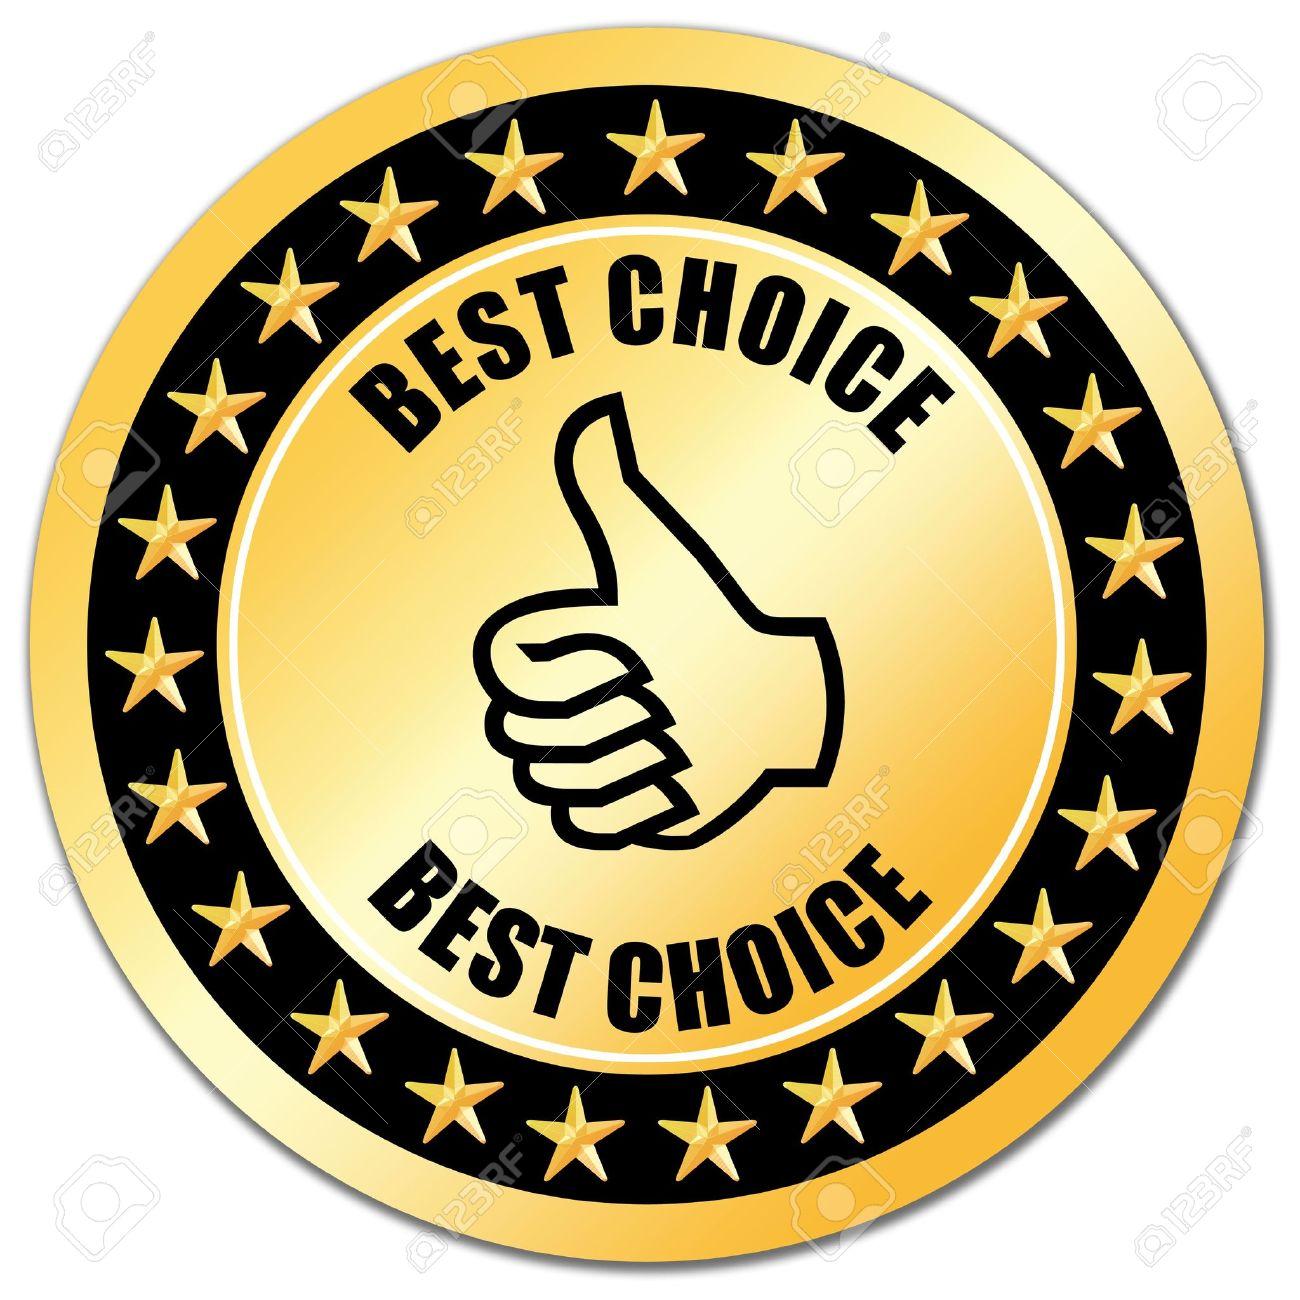 Best choice Stock Photo - 6597602